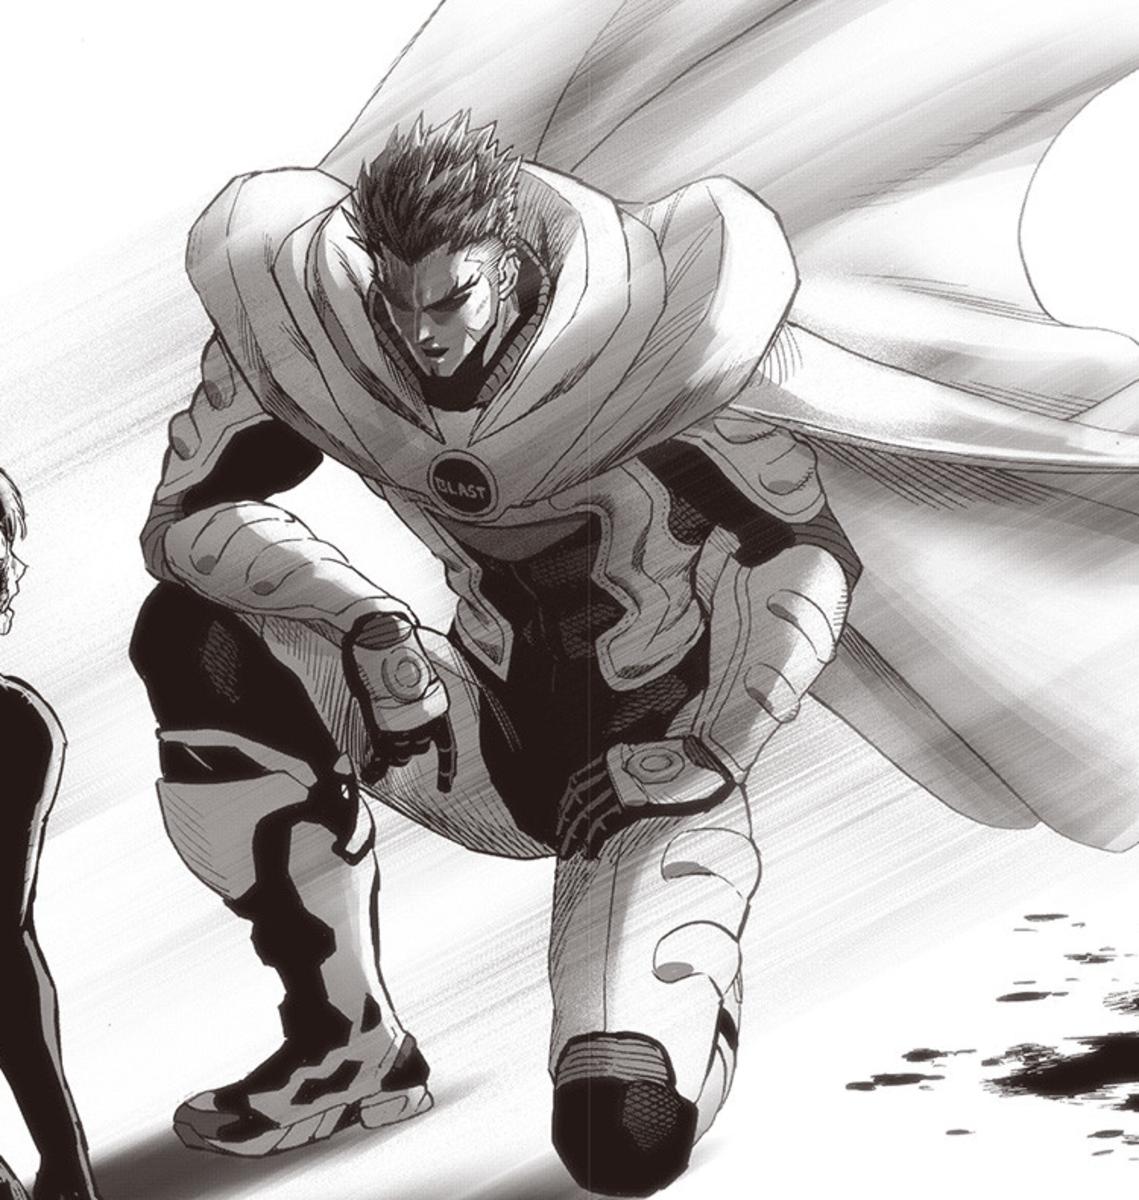 Blast in the One-Punch manga